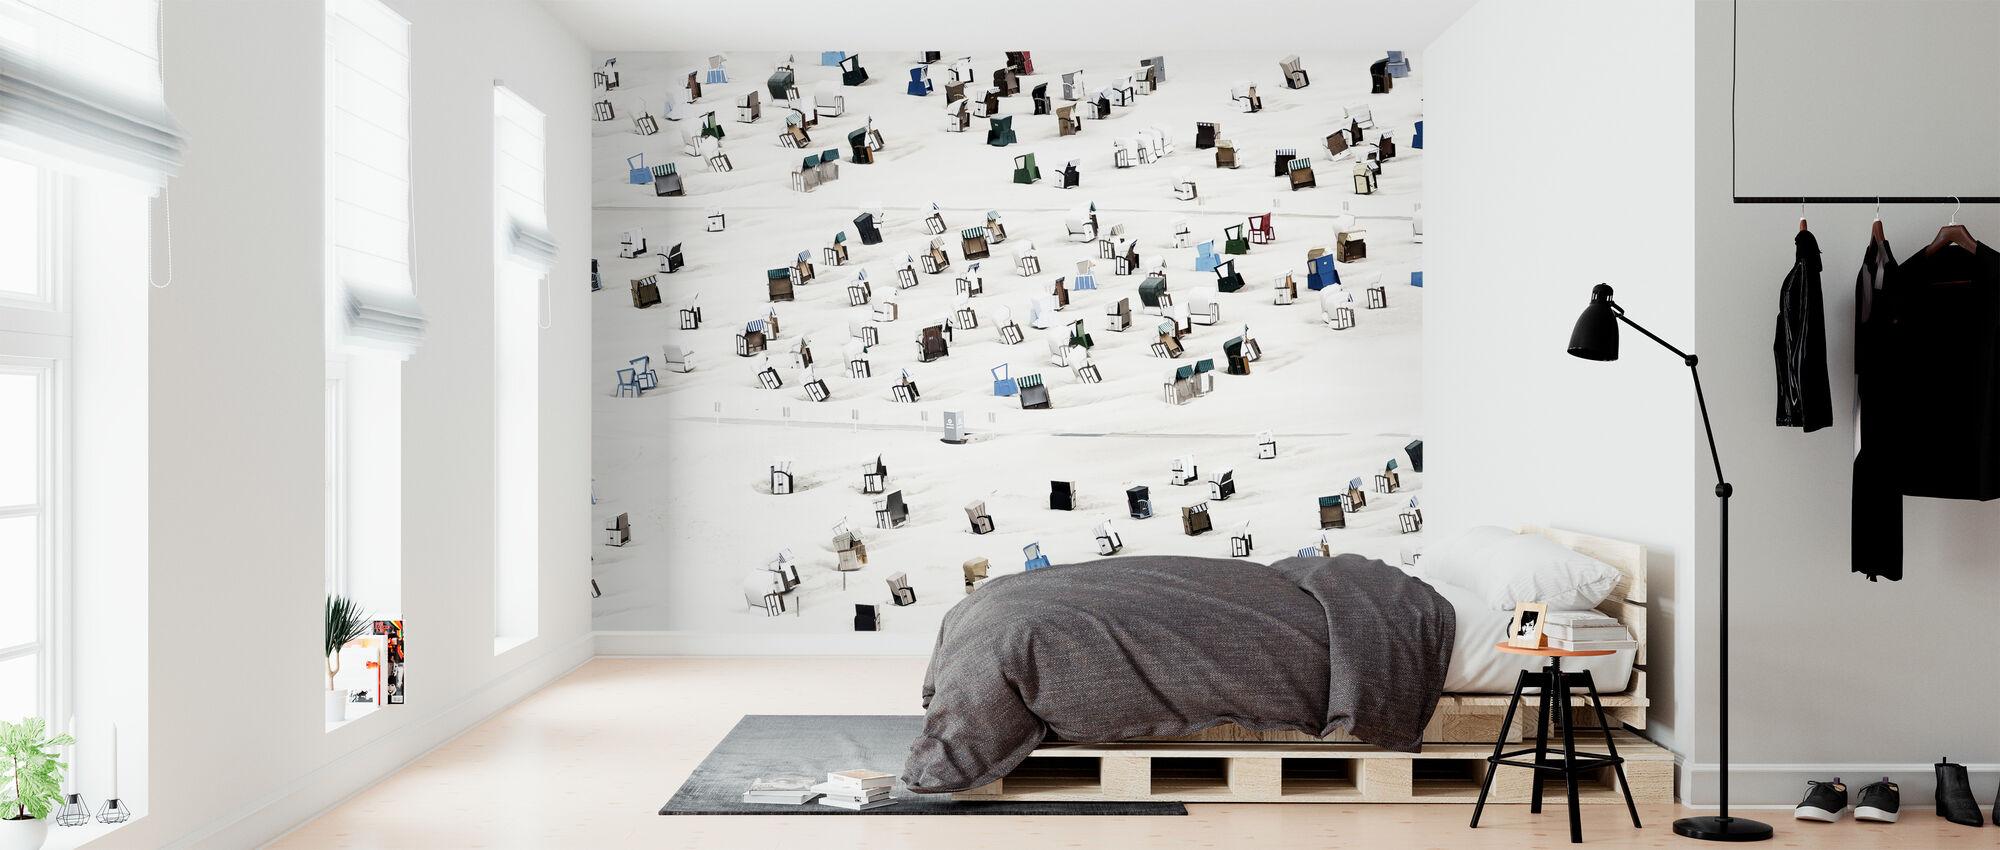 Germany Vacation - Wallpaper - Bedroom